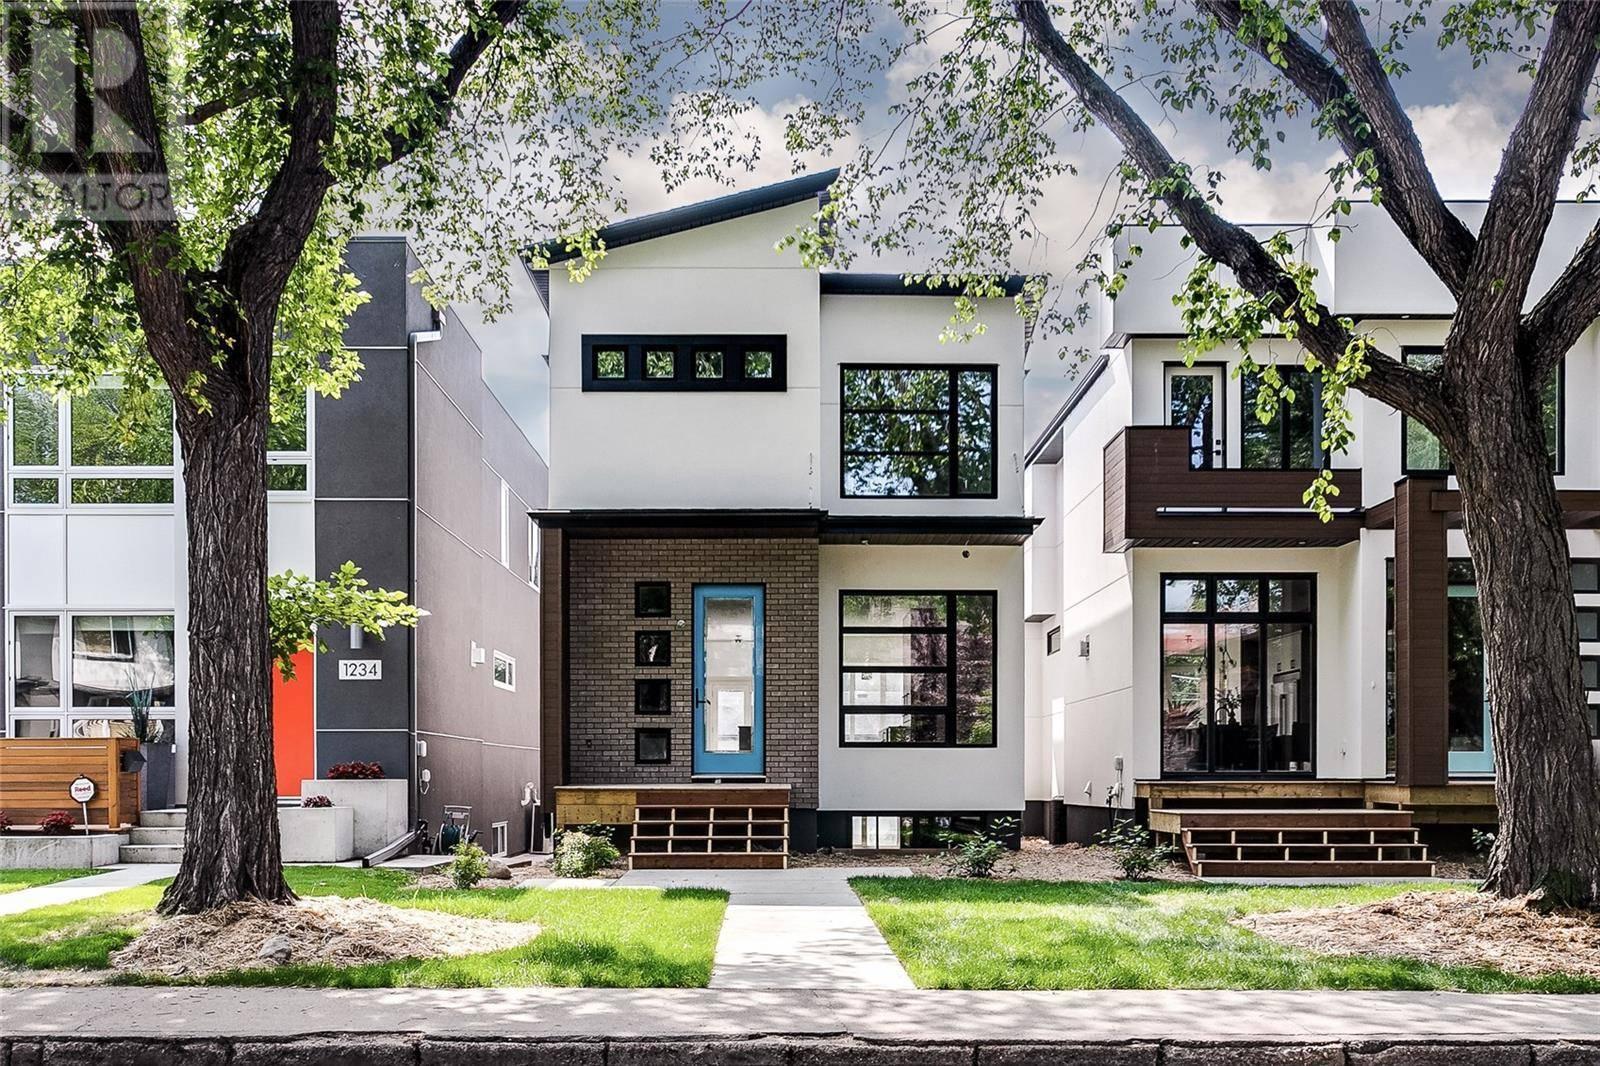 House for sale at 1232 15th St E Saskatoon Saskatchewan - MLS: SK788487